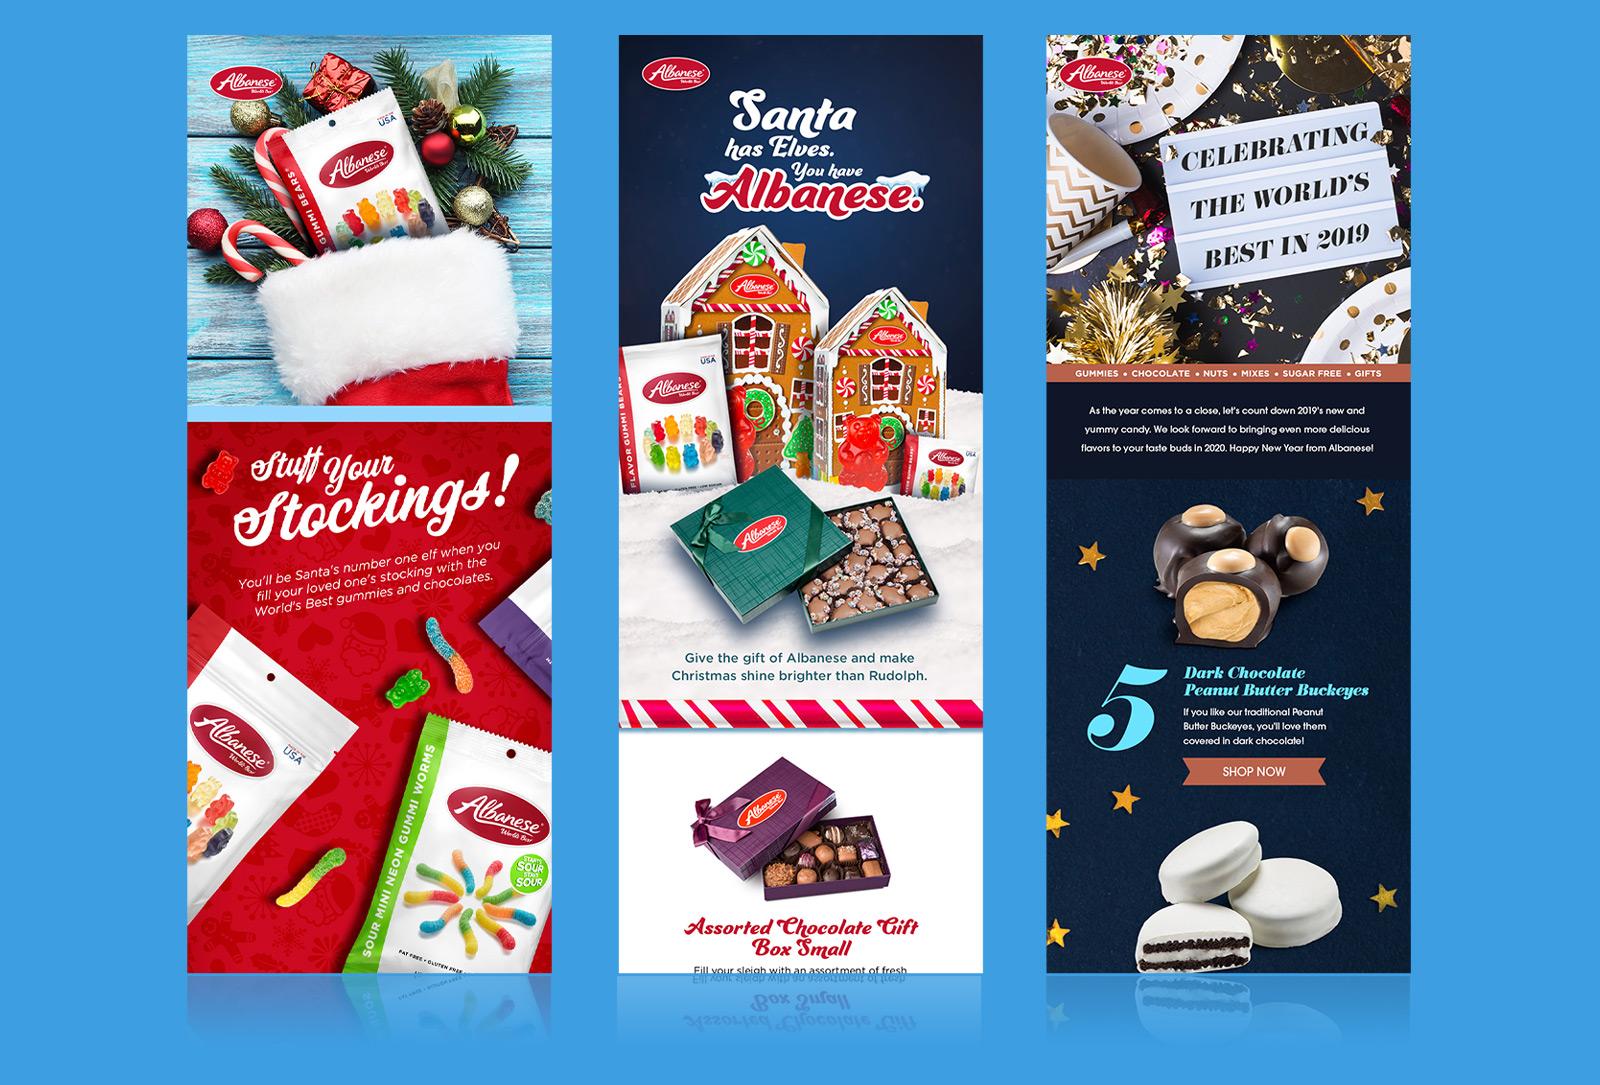 Albanese gummy bear Christmas stocking / gummy bear and worms stocking stuffer ad / Best in 2019 newsletter design